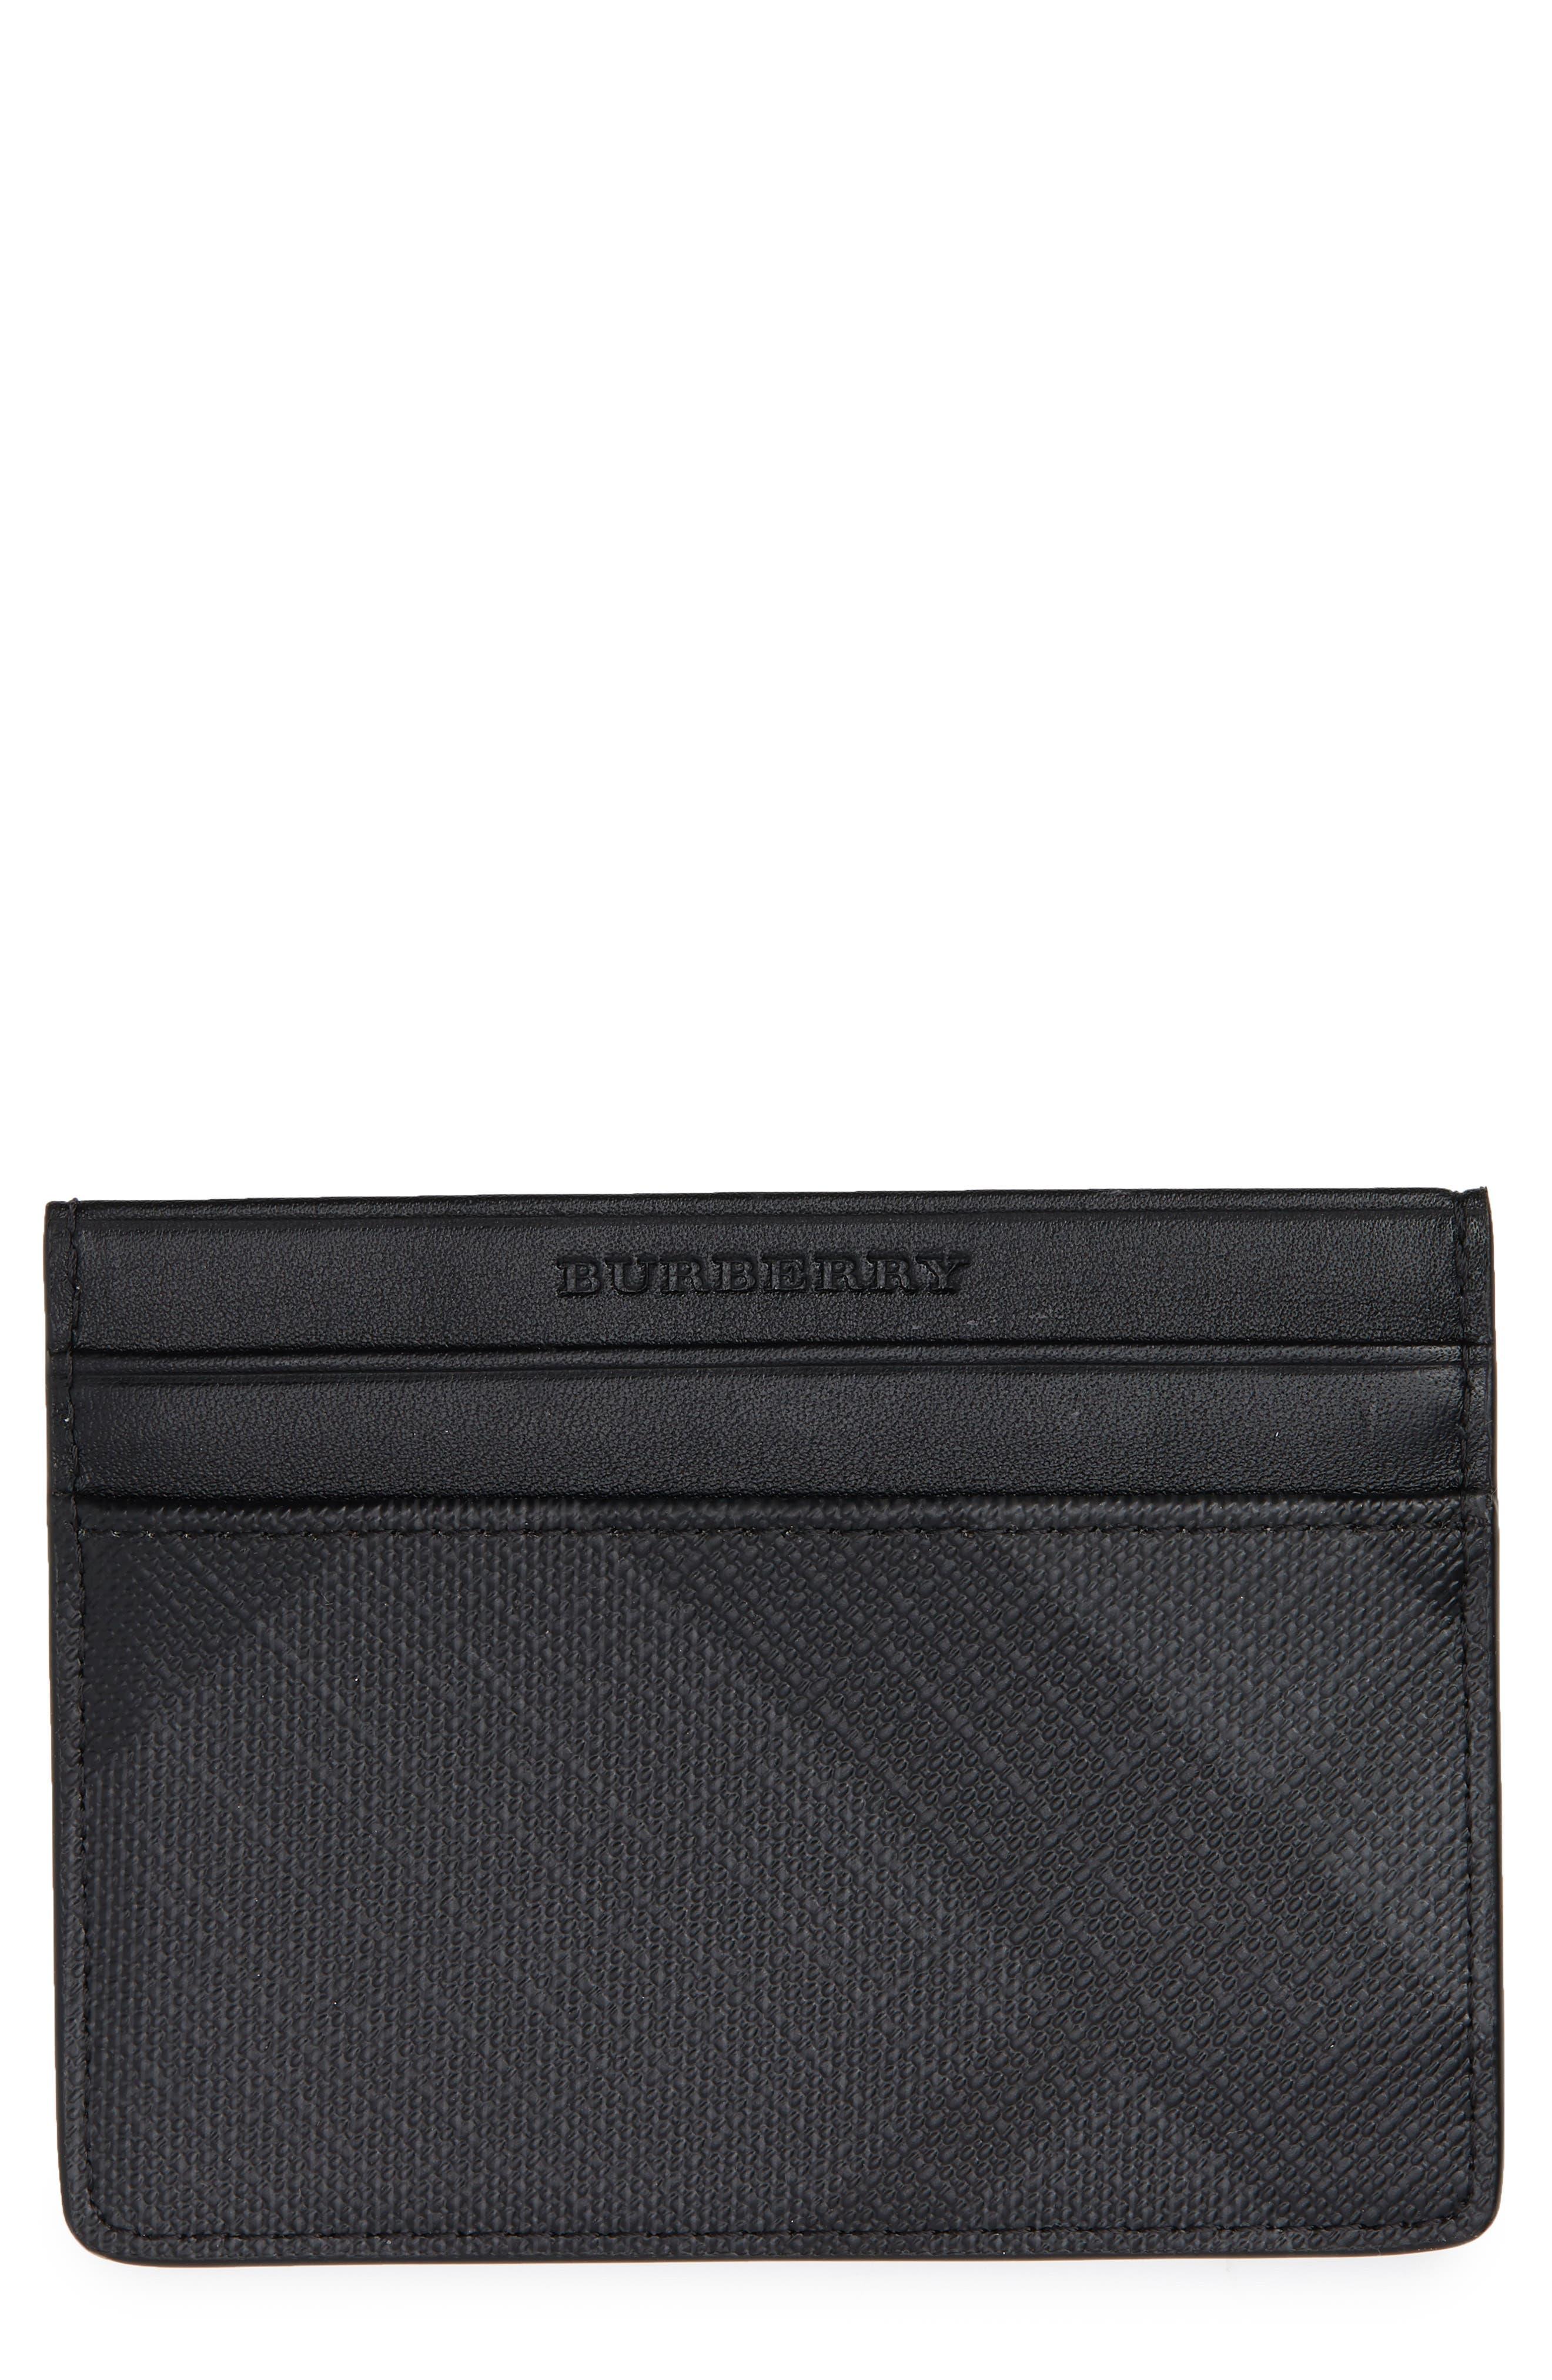 Sandon Check Faux Leather Card Case,                             Main thumbnail 1, color,                             CHARCOAL/ BLACK